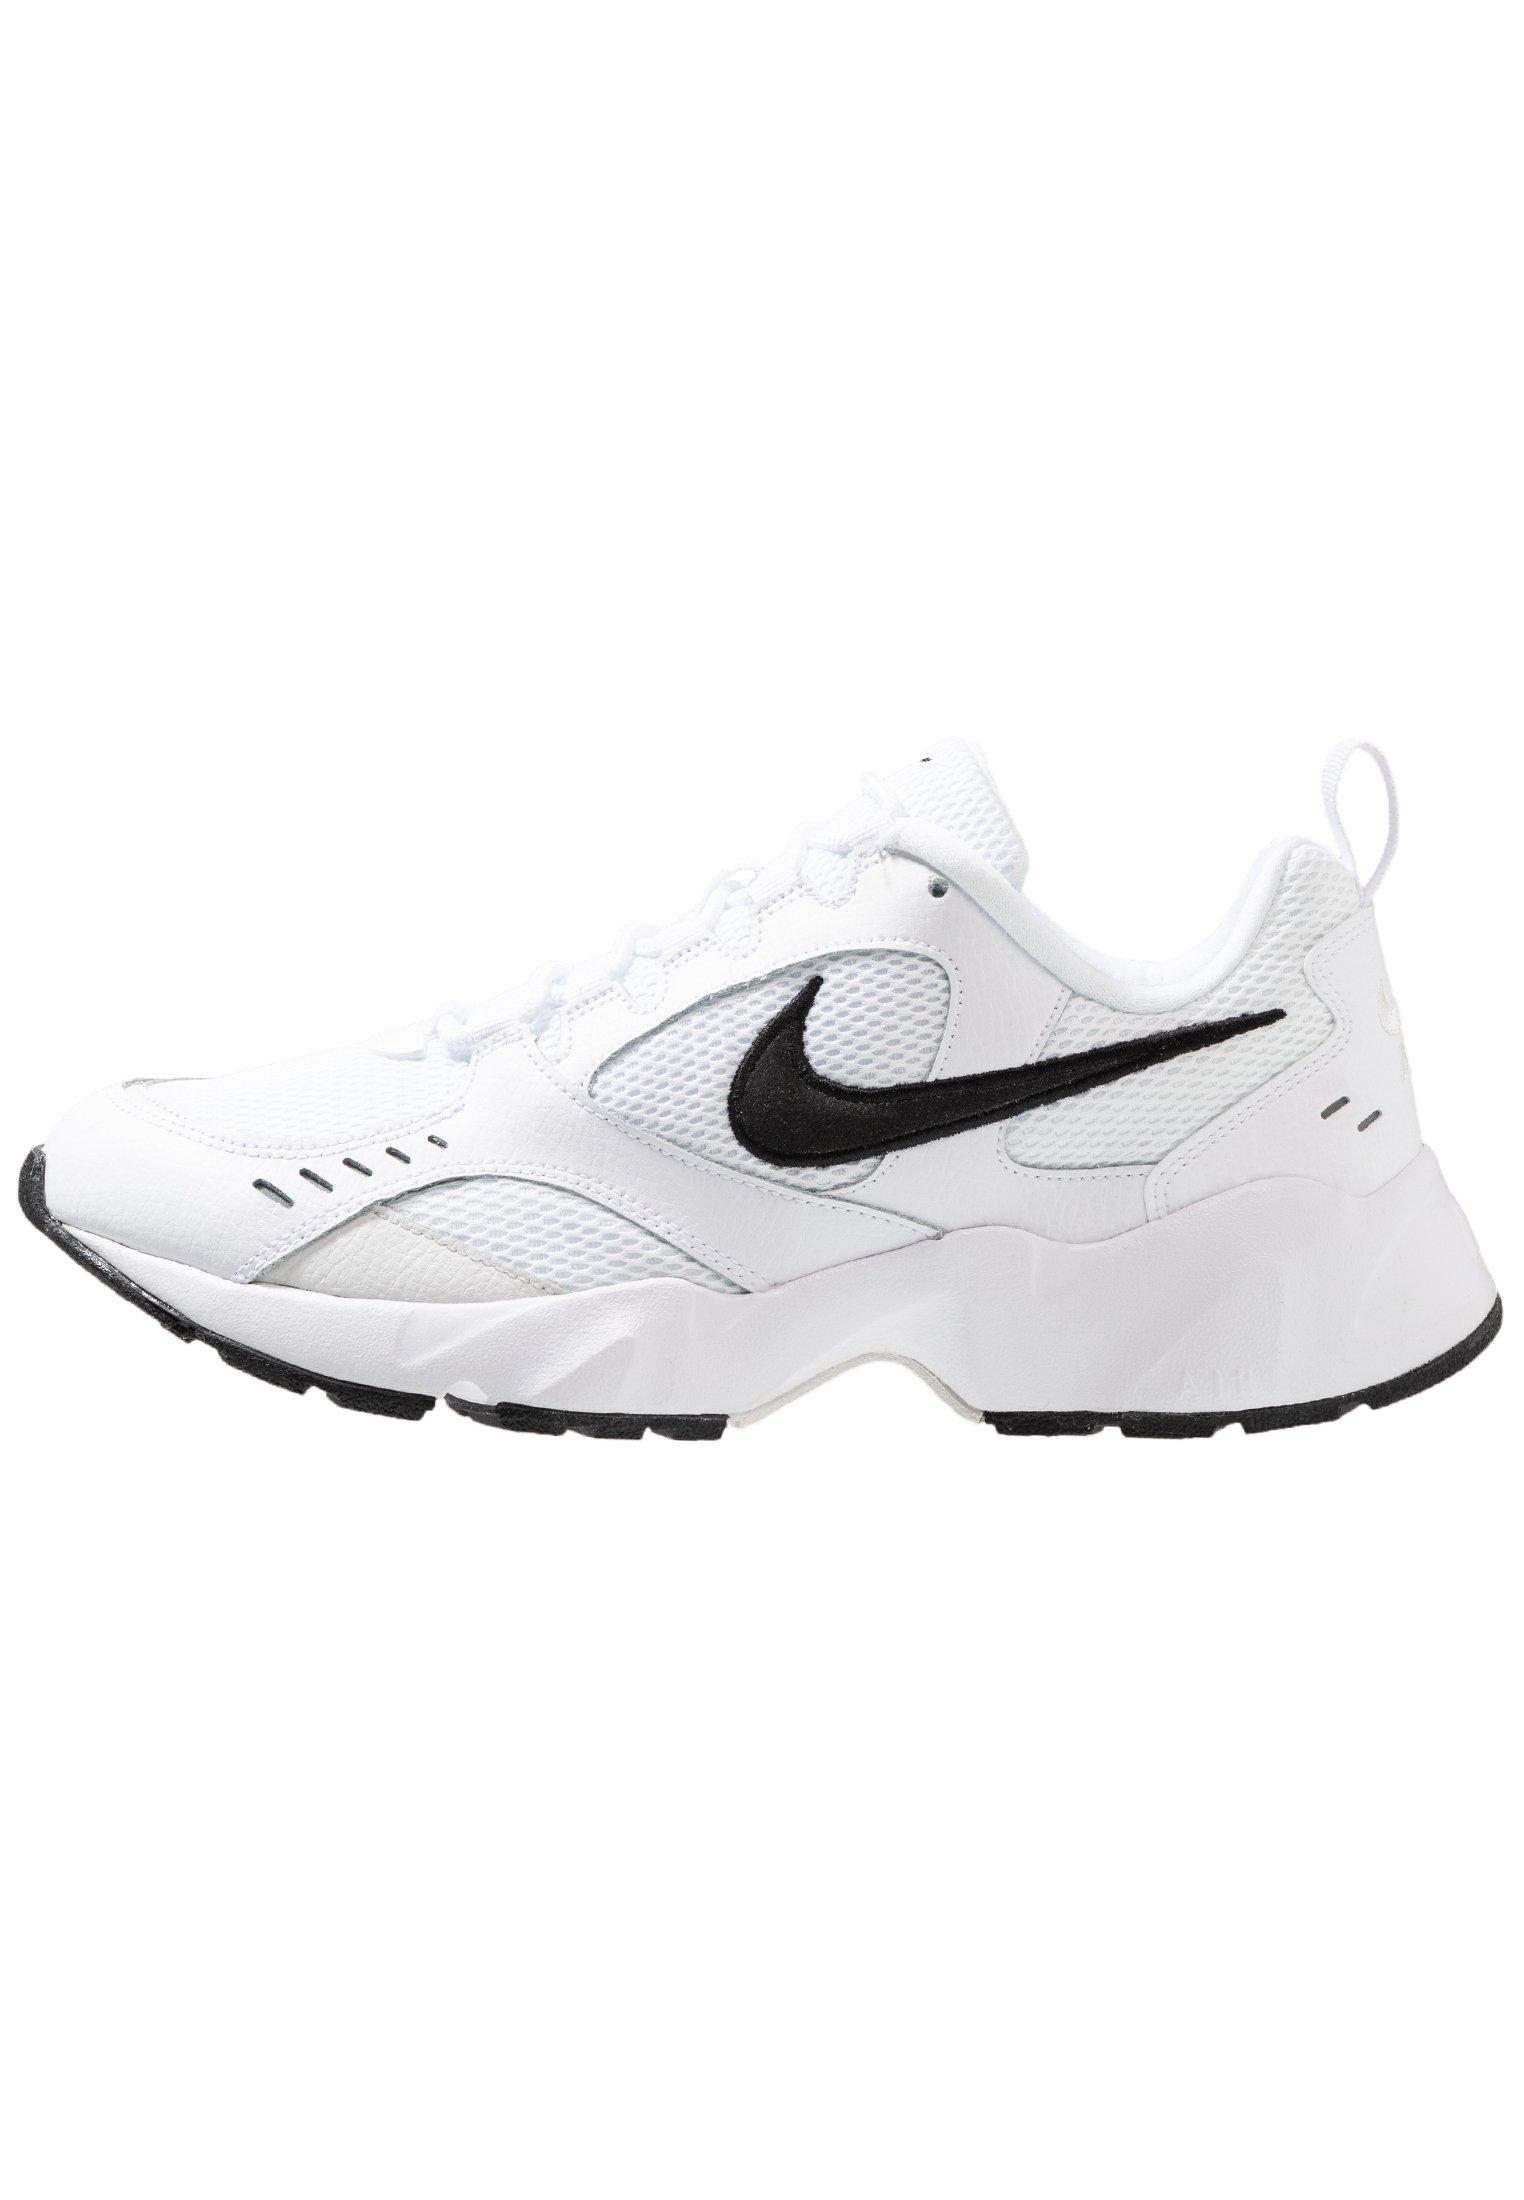 AIR HEIGHTS Sneakers whiteblackplatinum tint